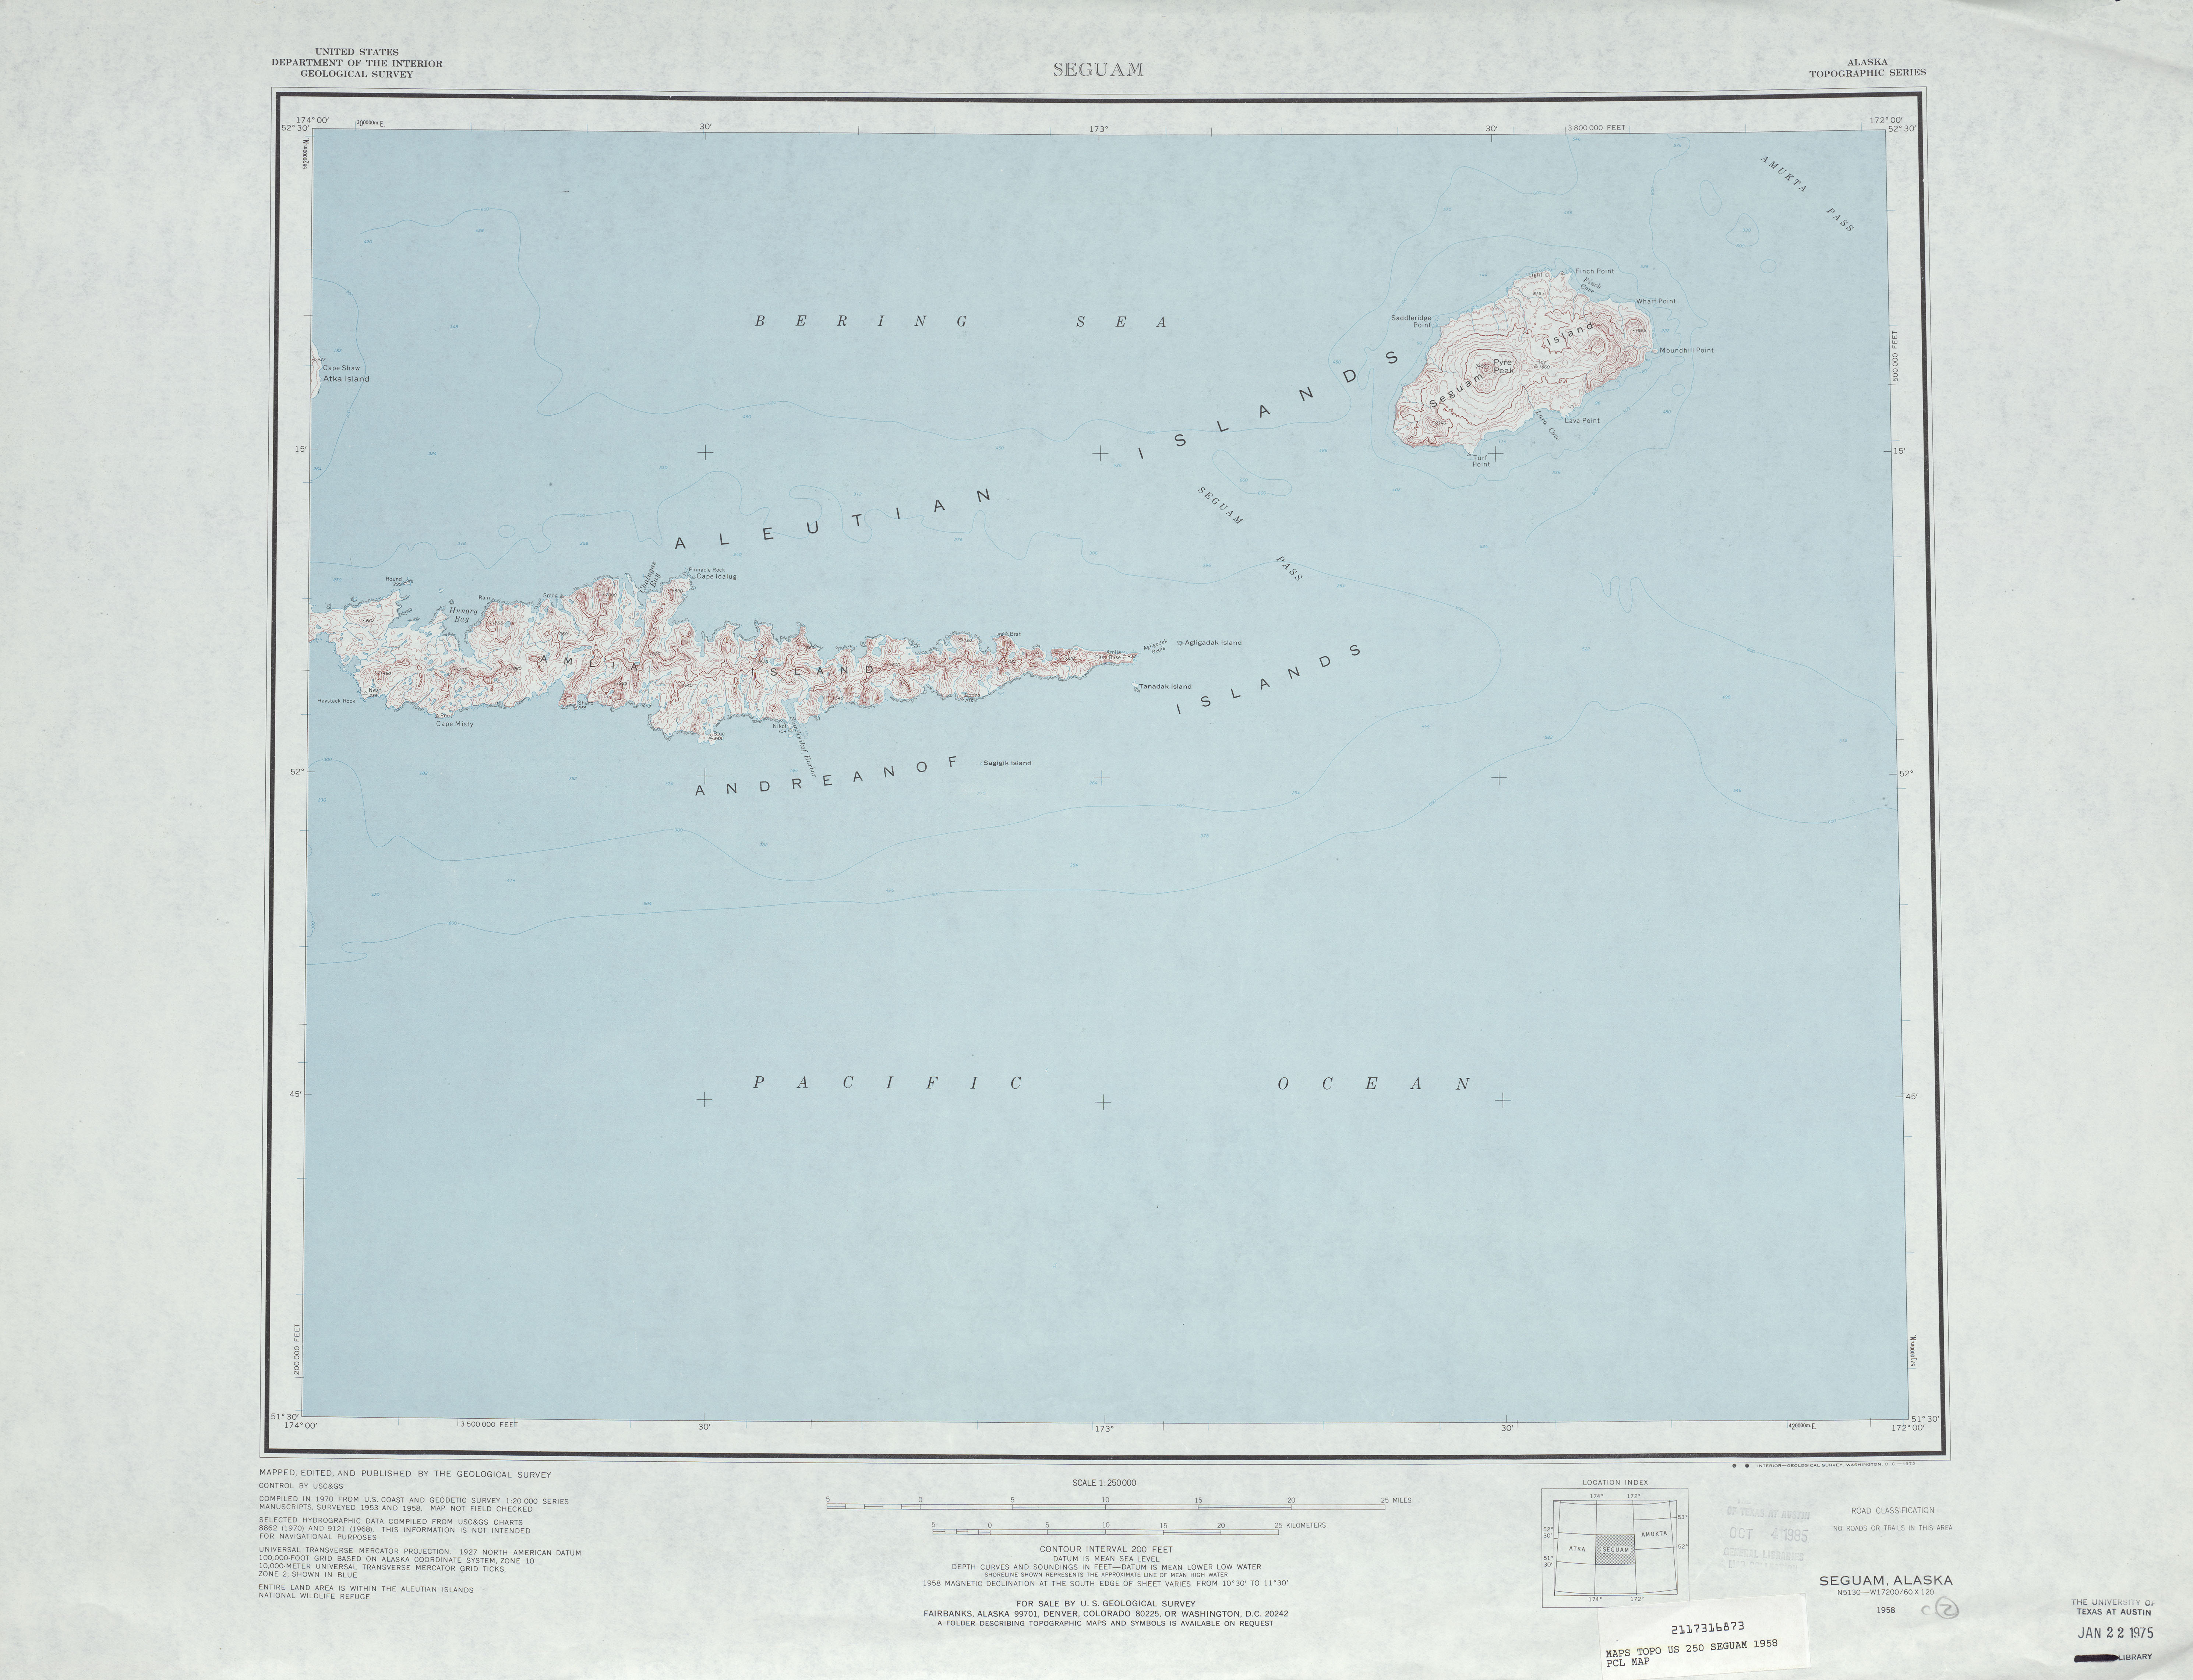 Seguam Topographic Map Sheet, United States 1958